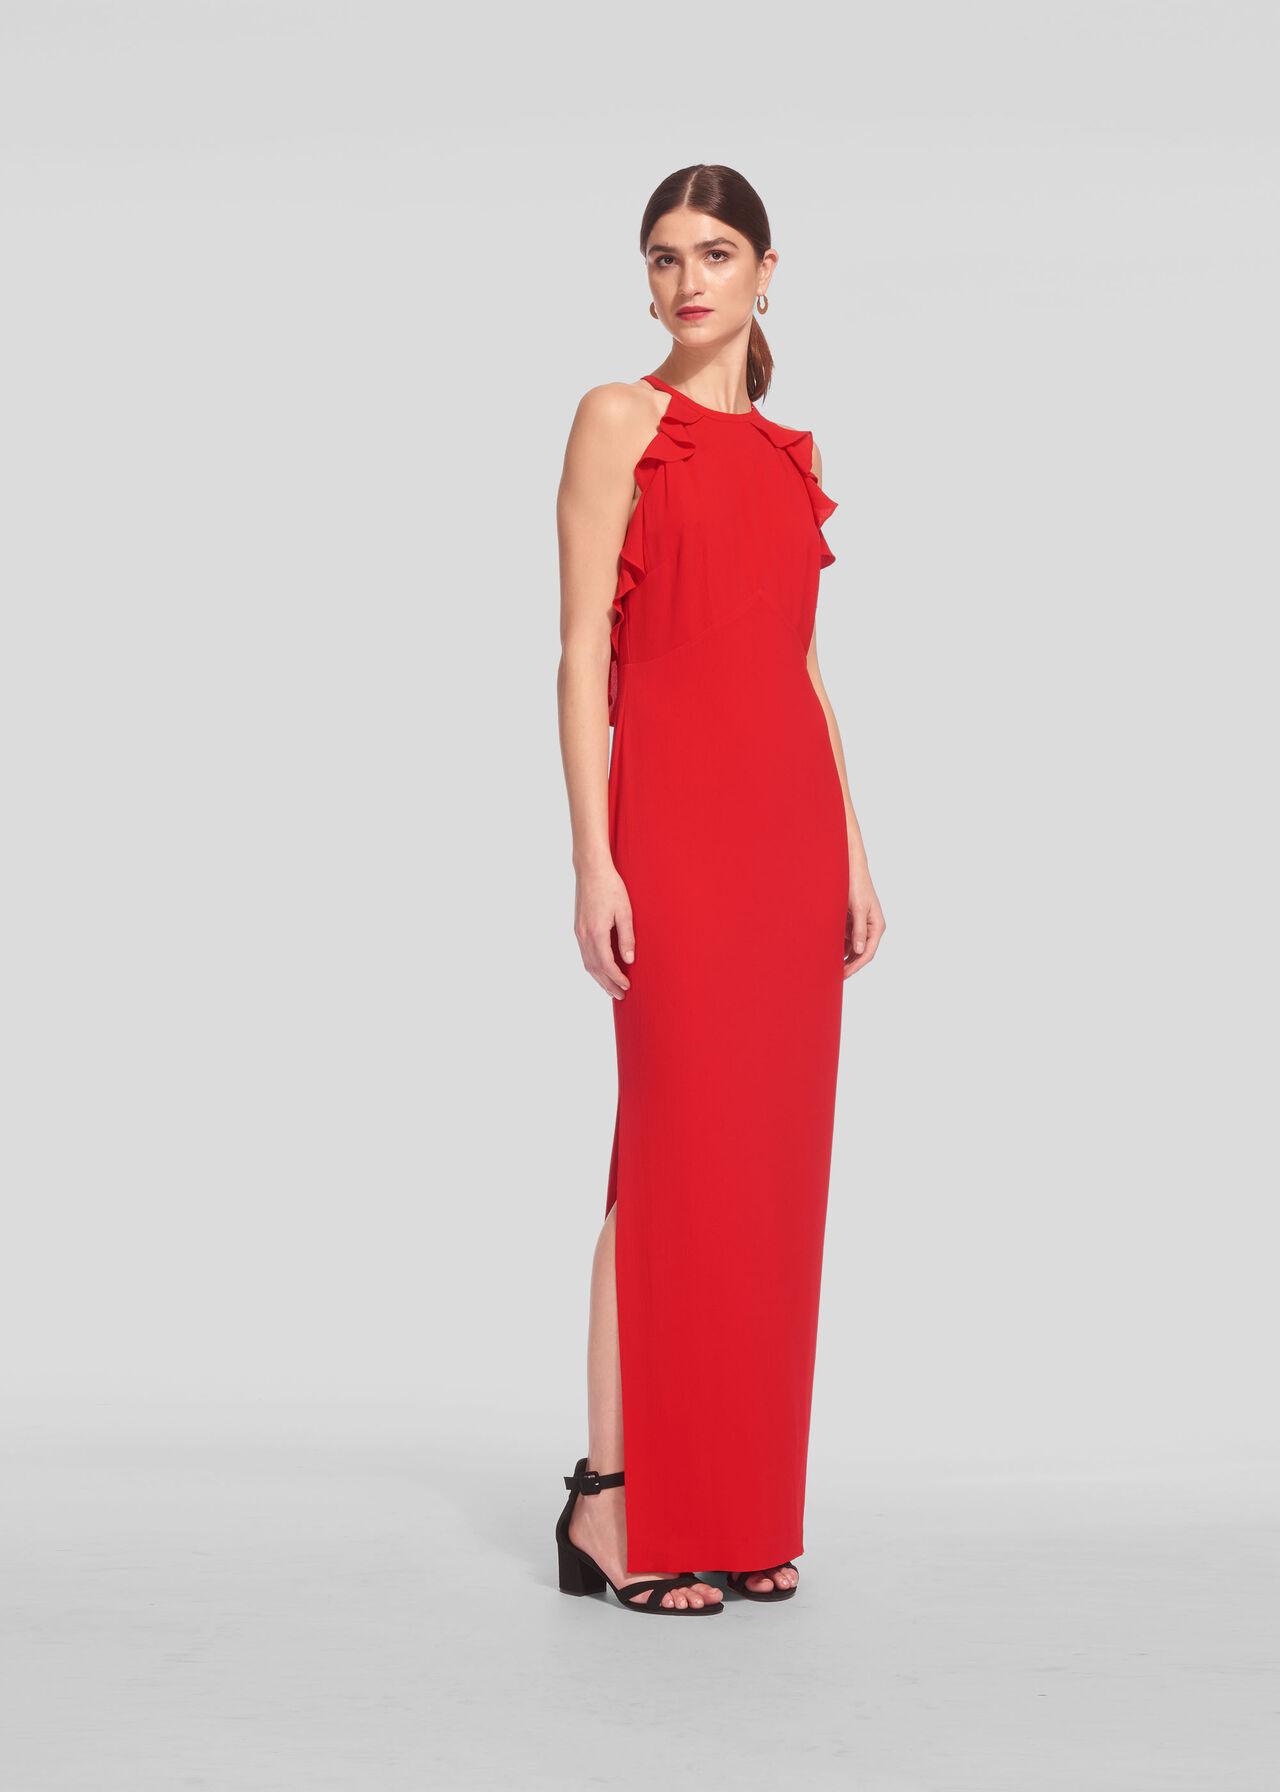 Sonia Frill Maxi Dress